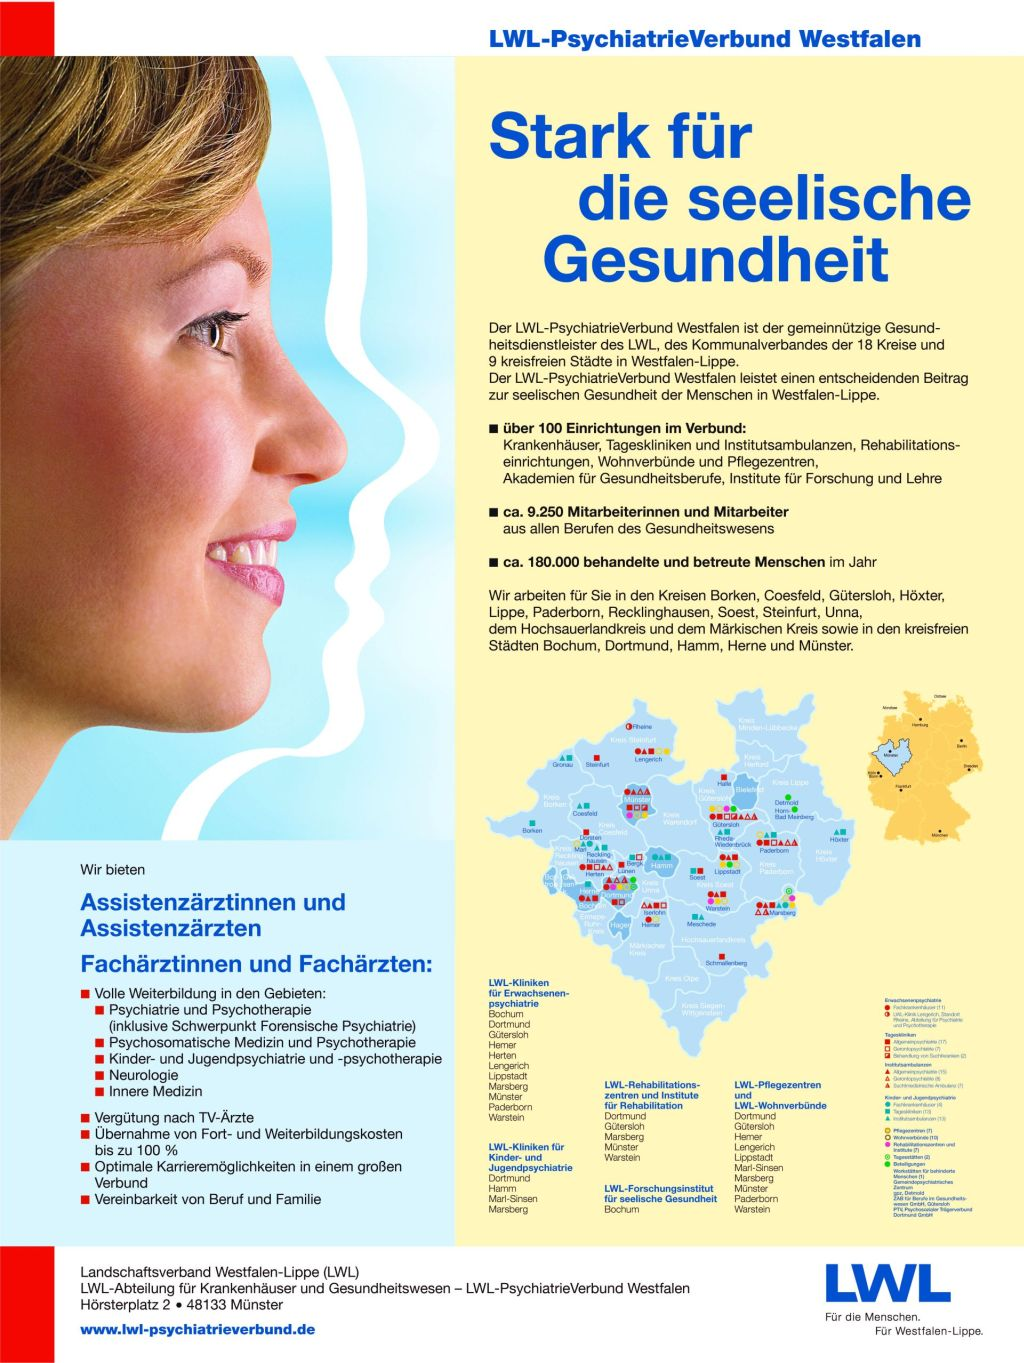 Imageanzeige des LWL-PsychiatrieVerbunds Westfalen